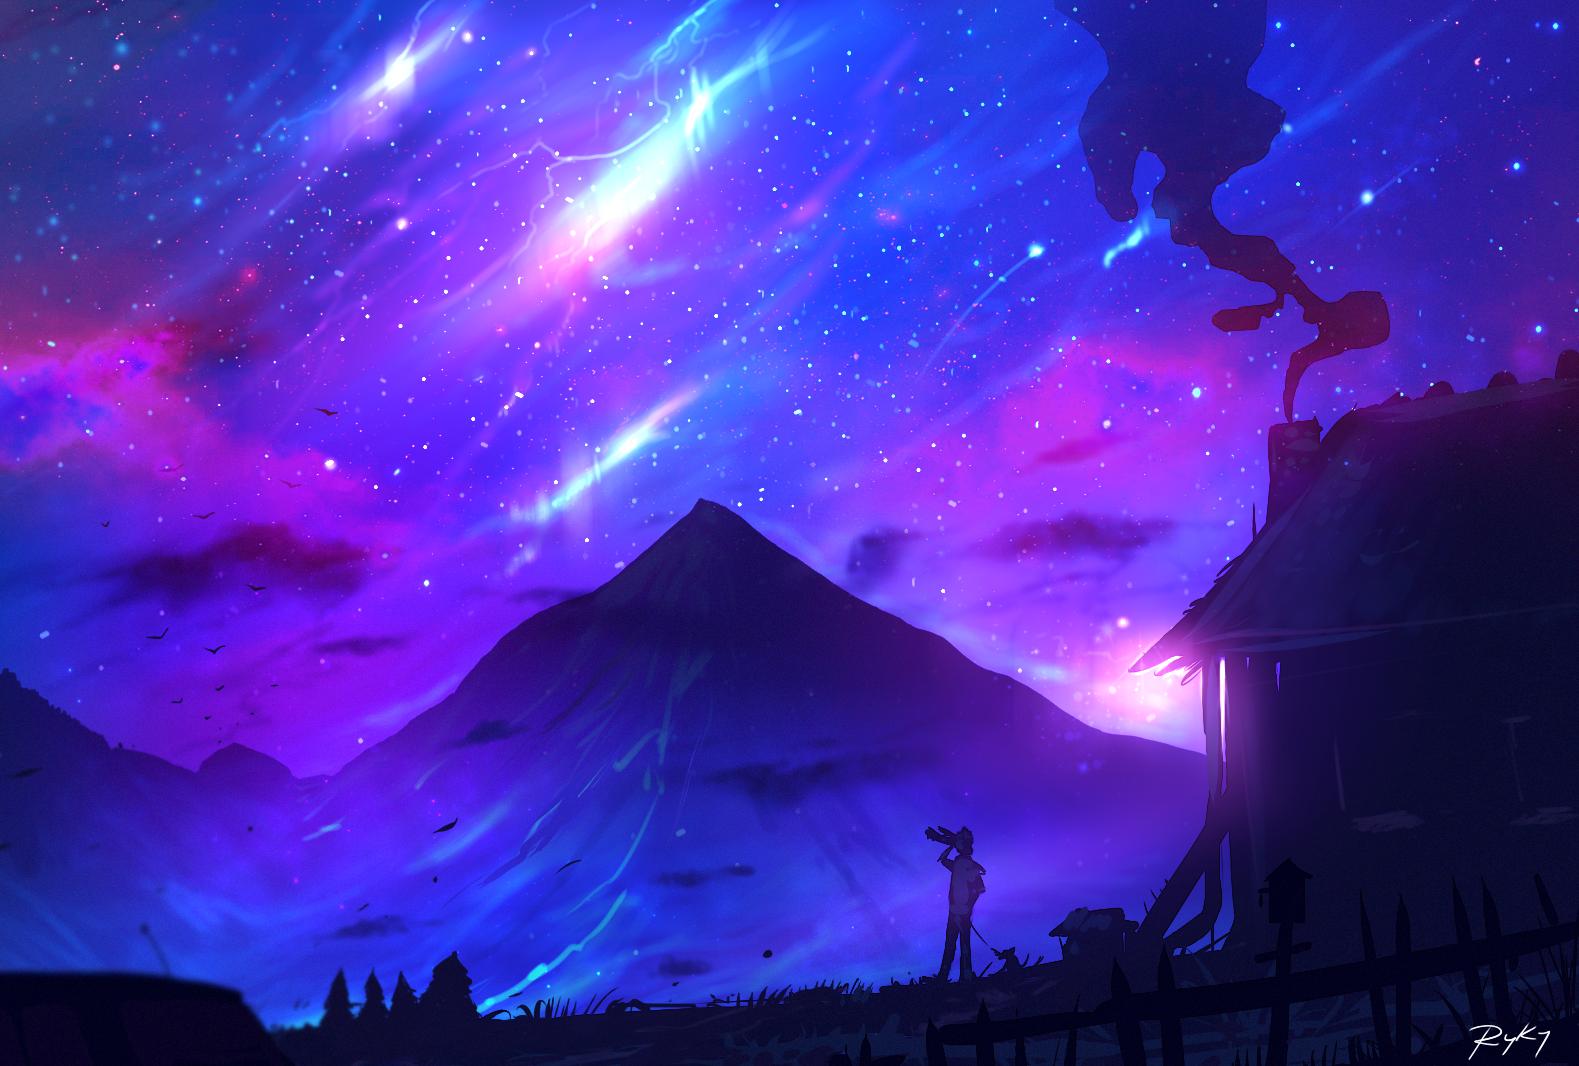 Purple Sky By Ryky On DeviantArt